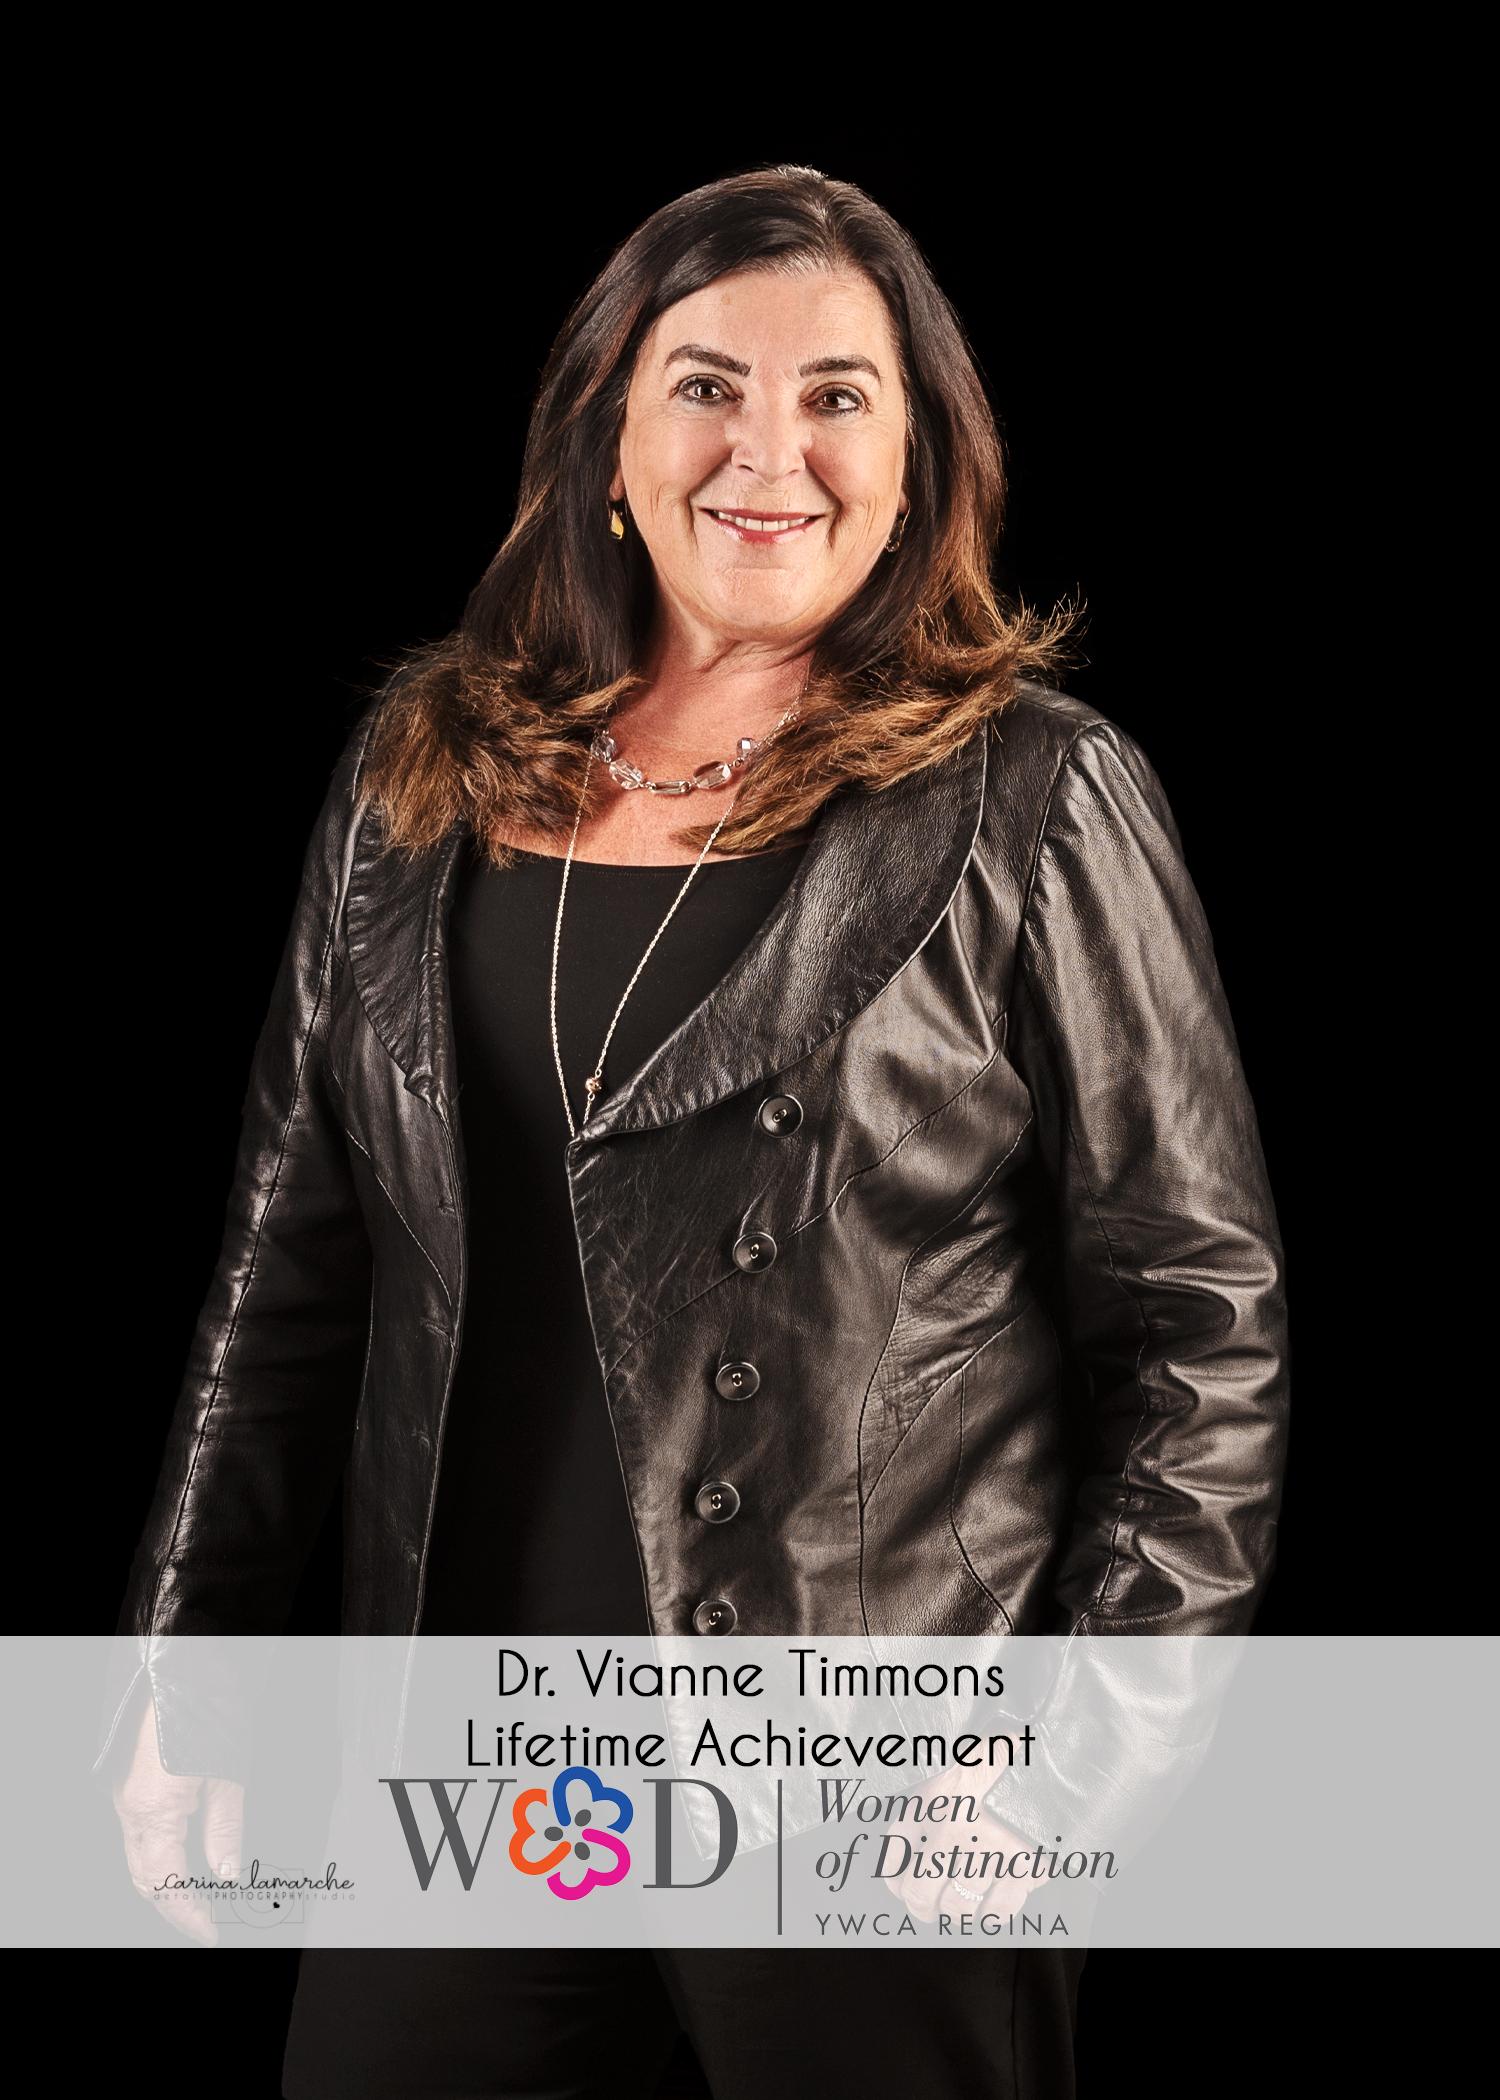 2019_103_Dr.Vianne_Timmons_5x7.1.jpg